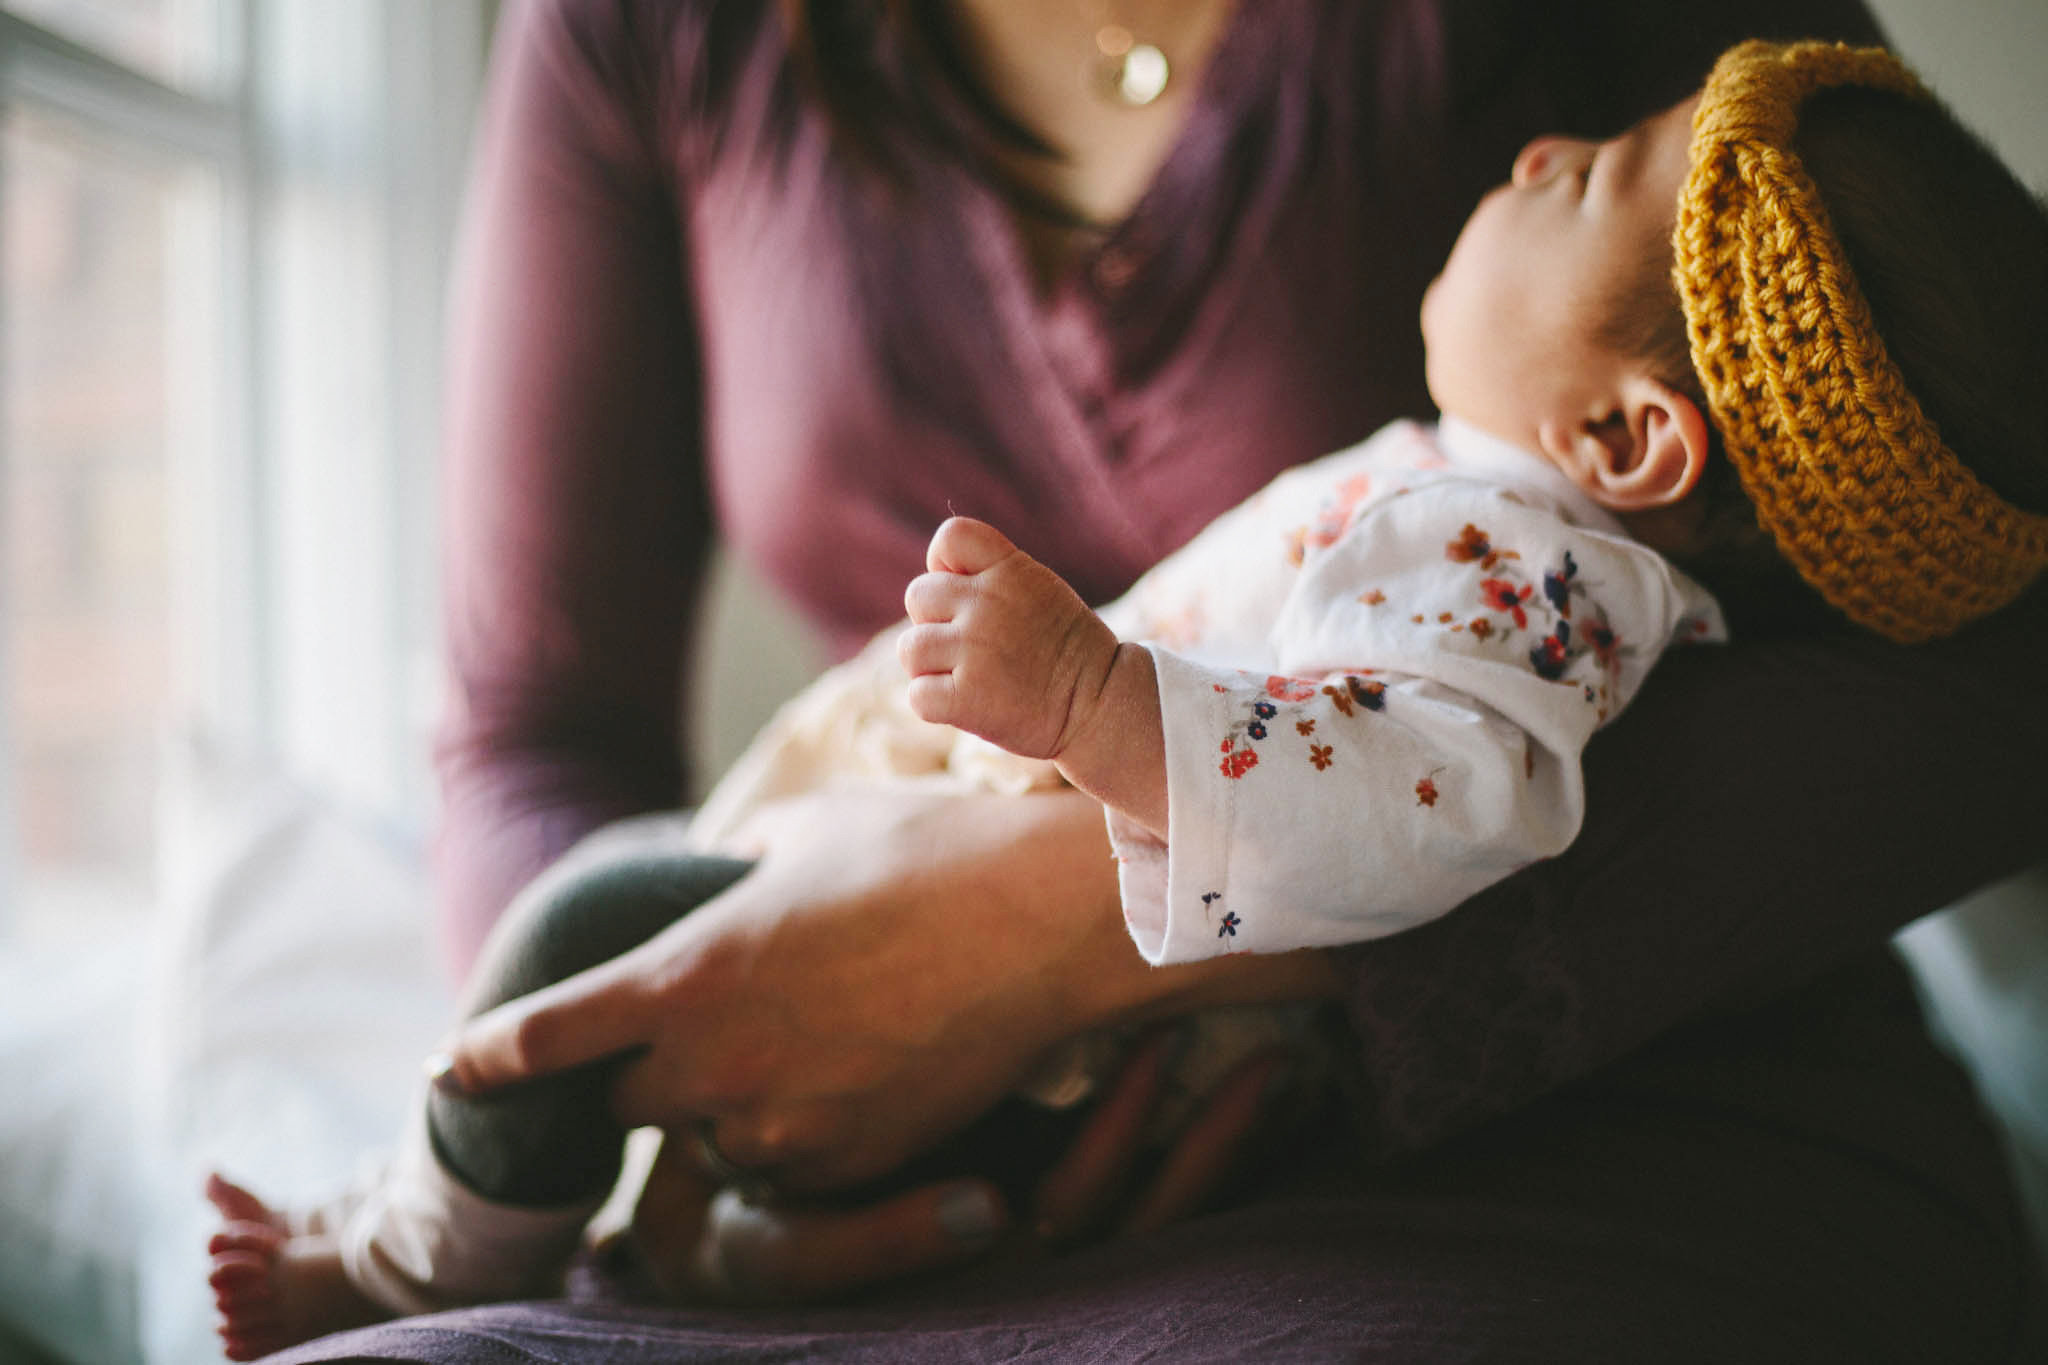 A mother's nursing journey